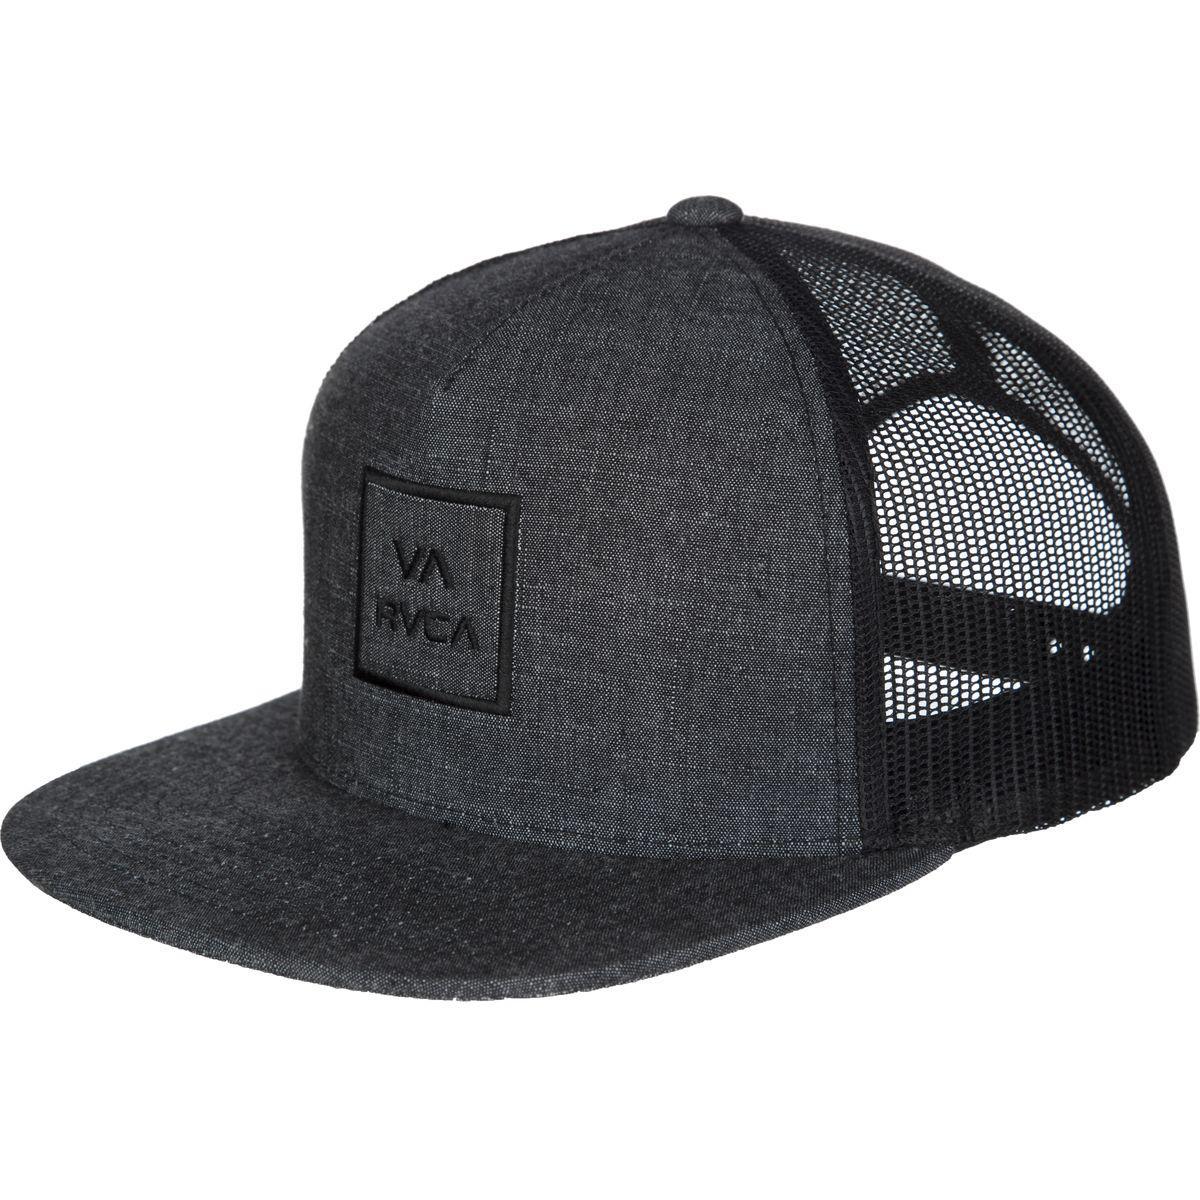 Lyst - RVCA Va All The Way Iii Trucker Hat in Black for Men 8e78bc34603